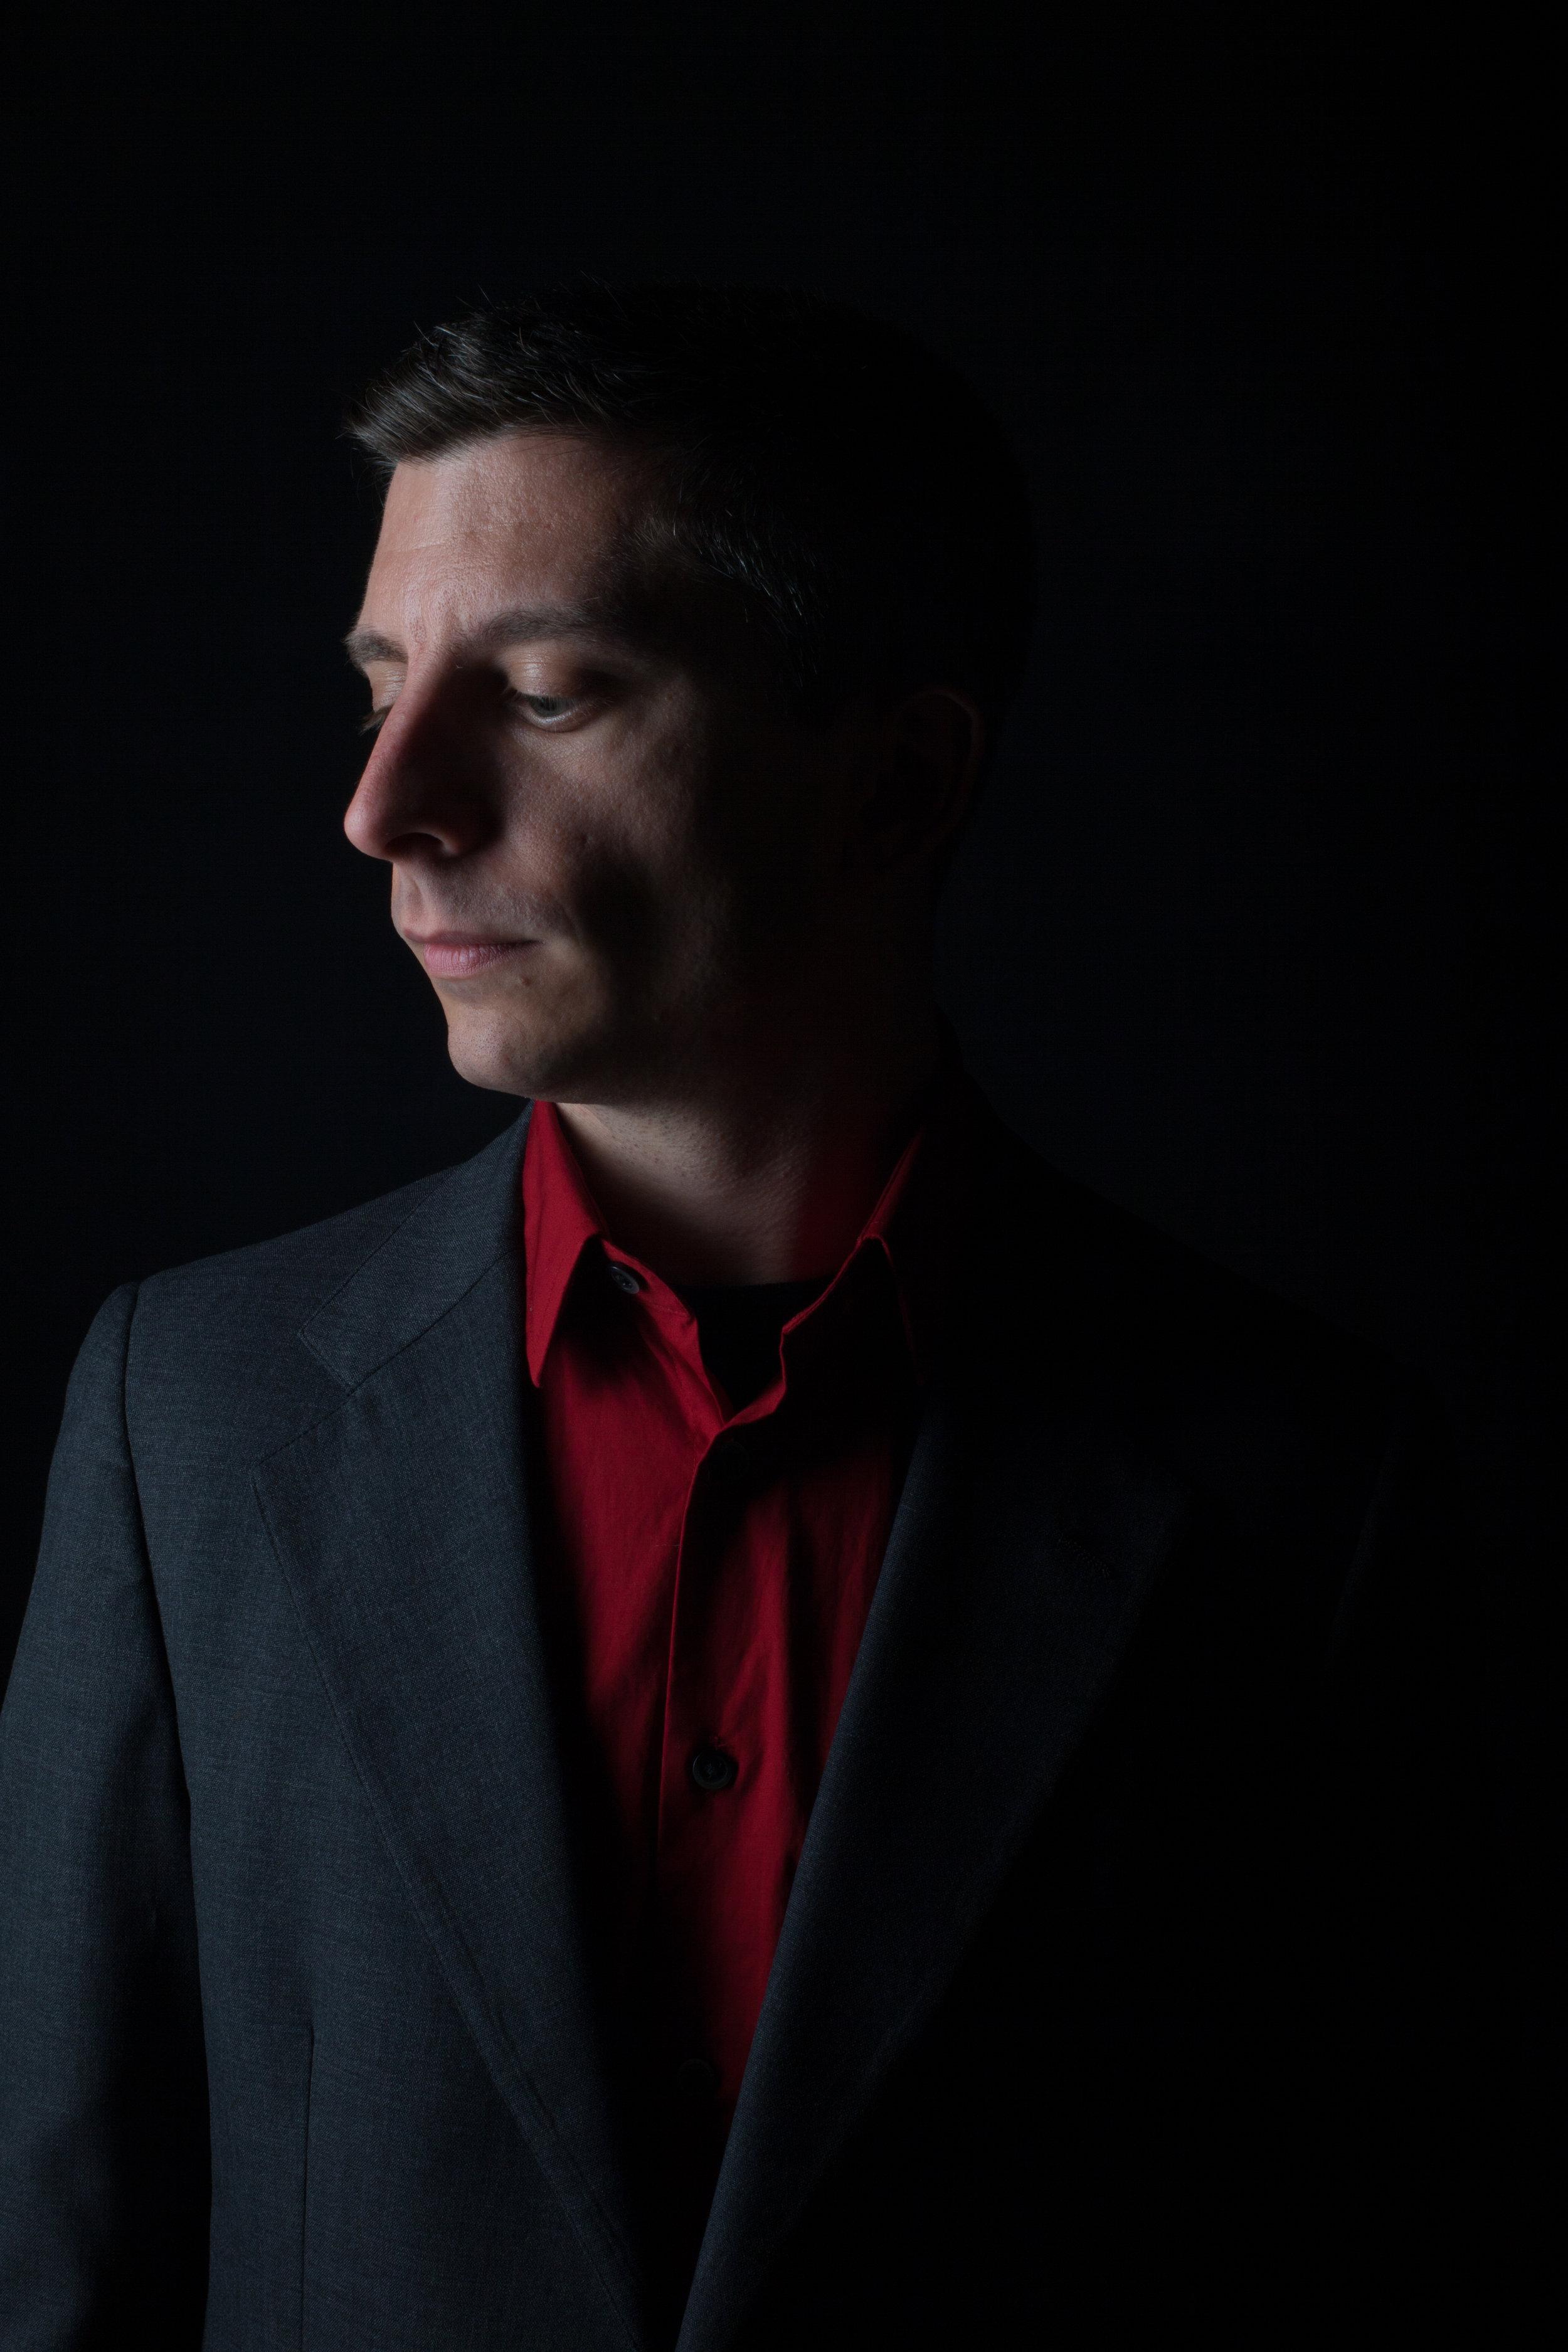 Kevin-J-Cope-Red-Shirt-Sideface-Dark-credit-Brian-Mengini.jpg